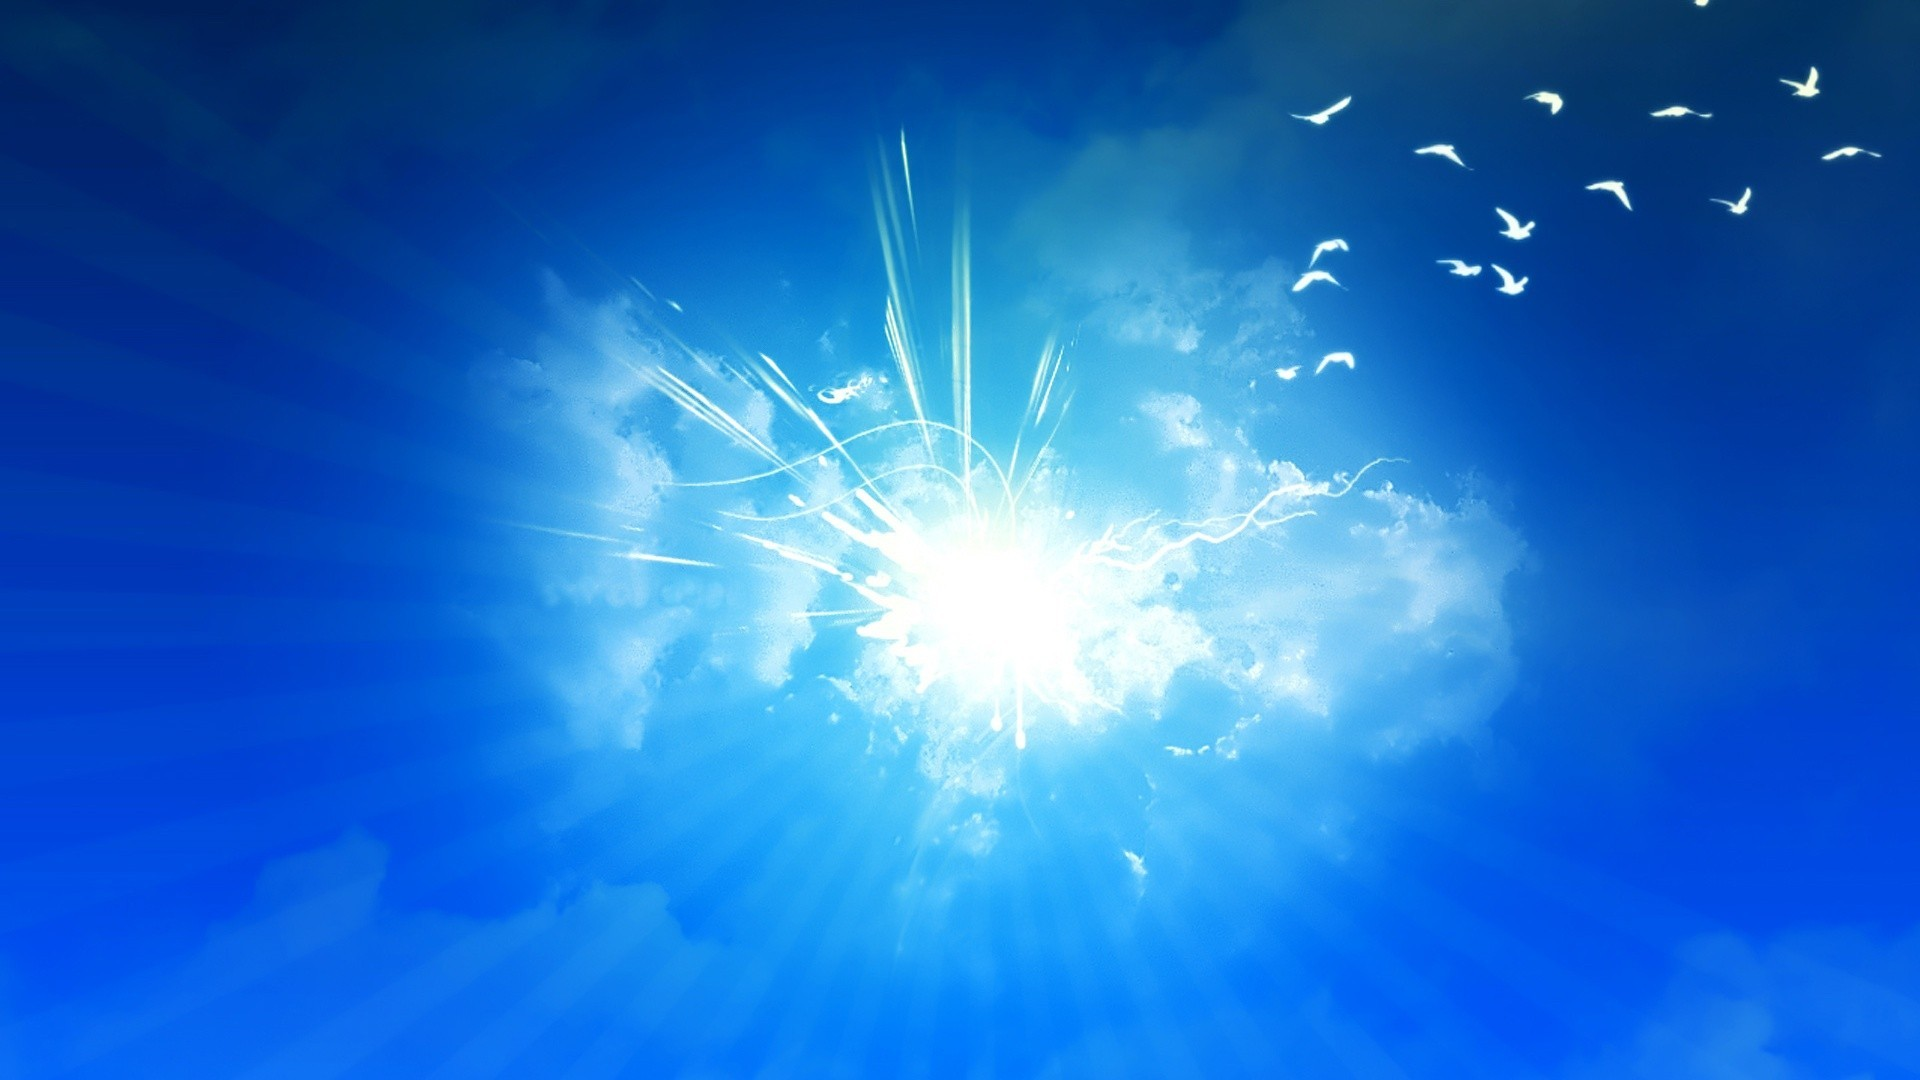 Seagull Fantastic Outstanding Nice Birds Sunshine Beautiful Wonderful  Sunlight Color Pretty Awesome Heaven Stunning Blue Sun Sky Amazing Hope  Light …